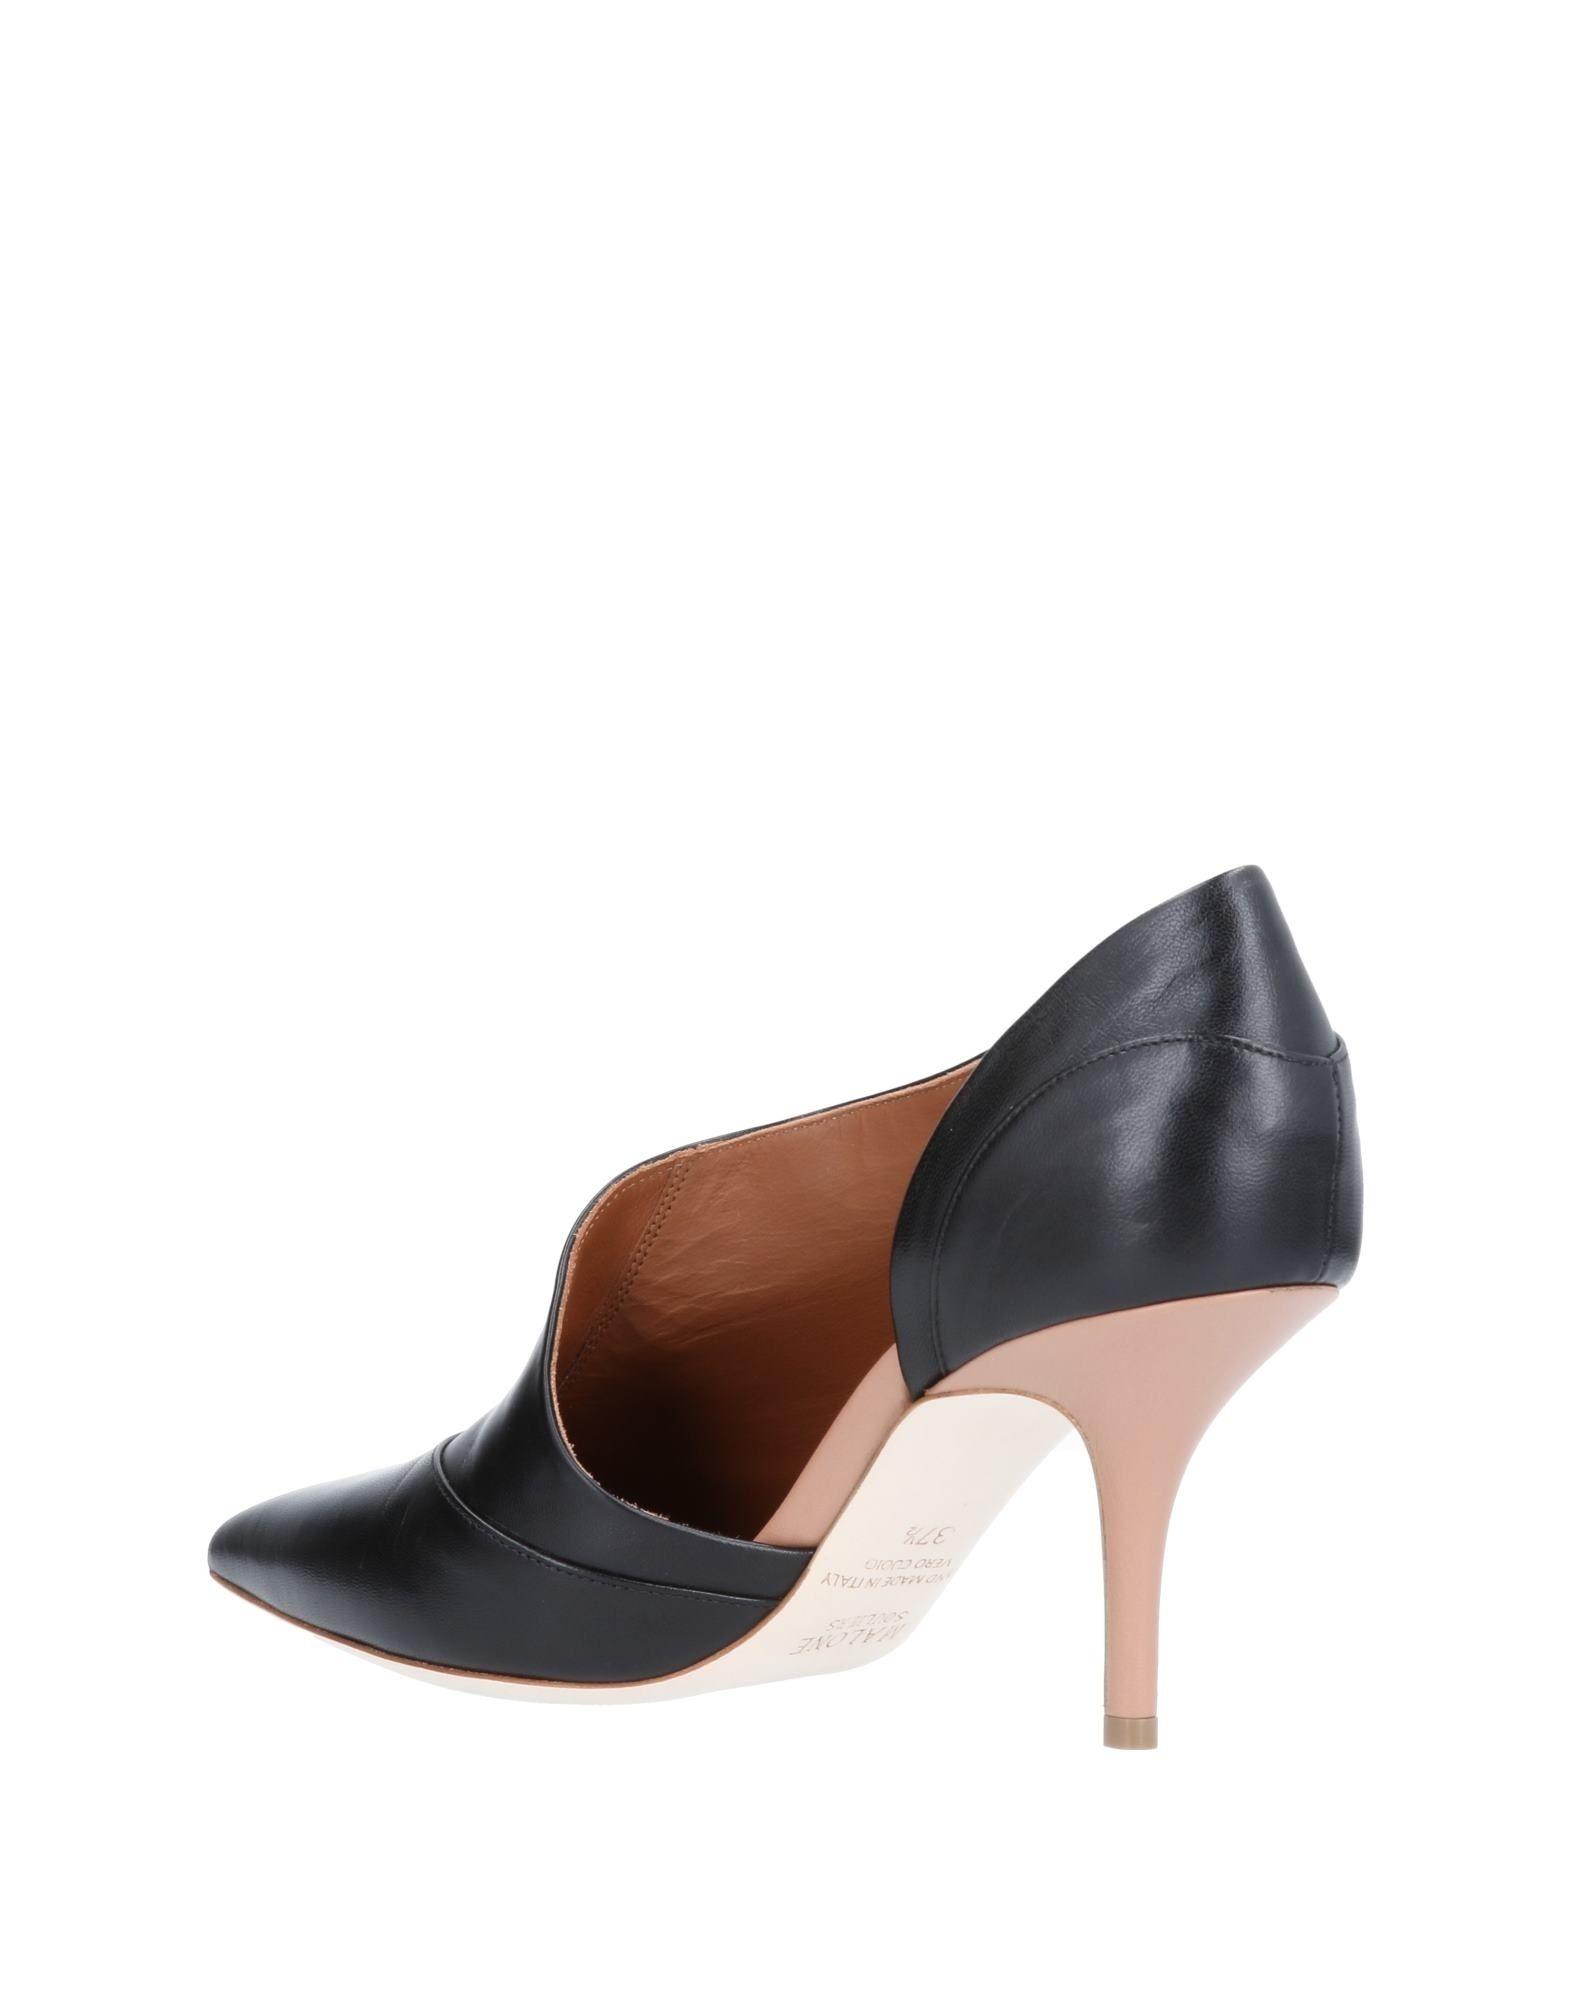 Rabatt Schuhe Malone Souliers Pumps Damen   Damen 11500912AA d1035e